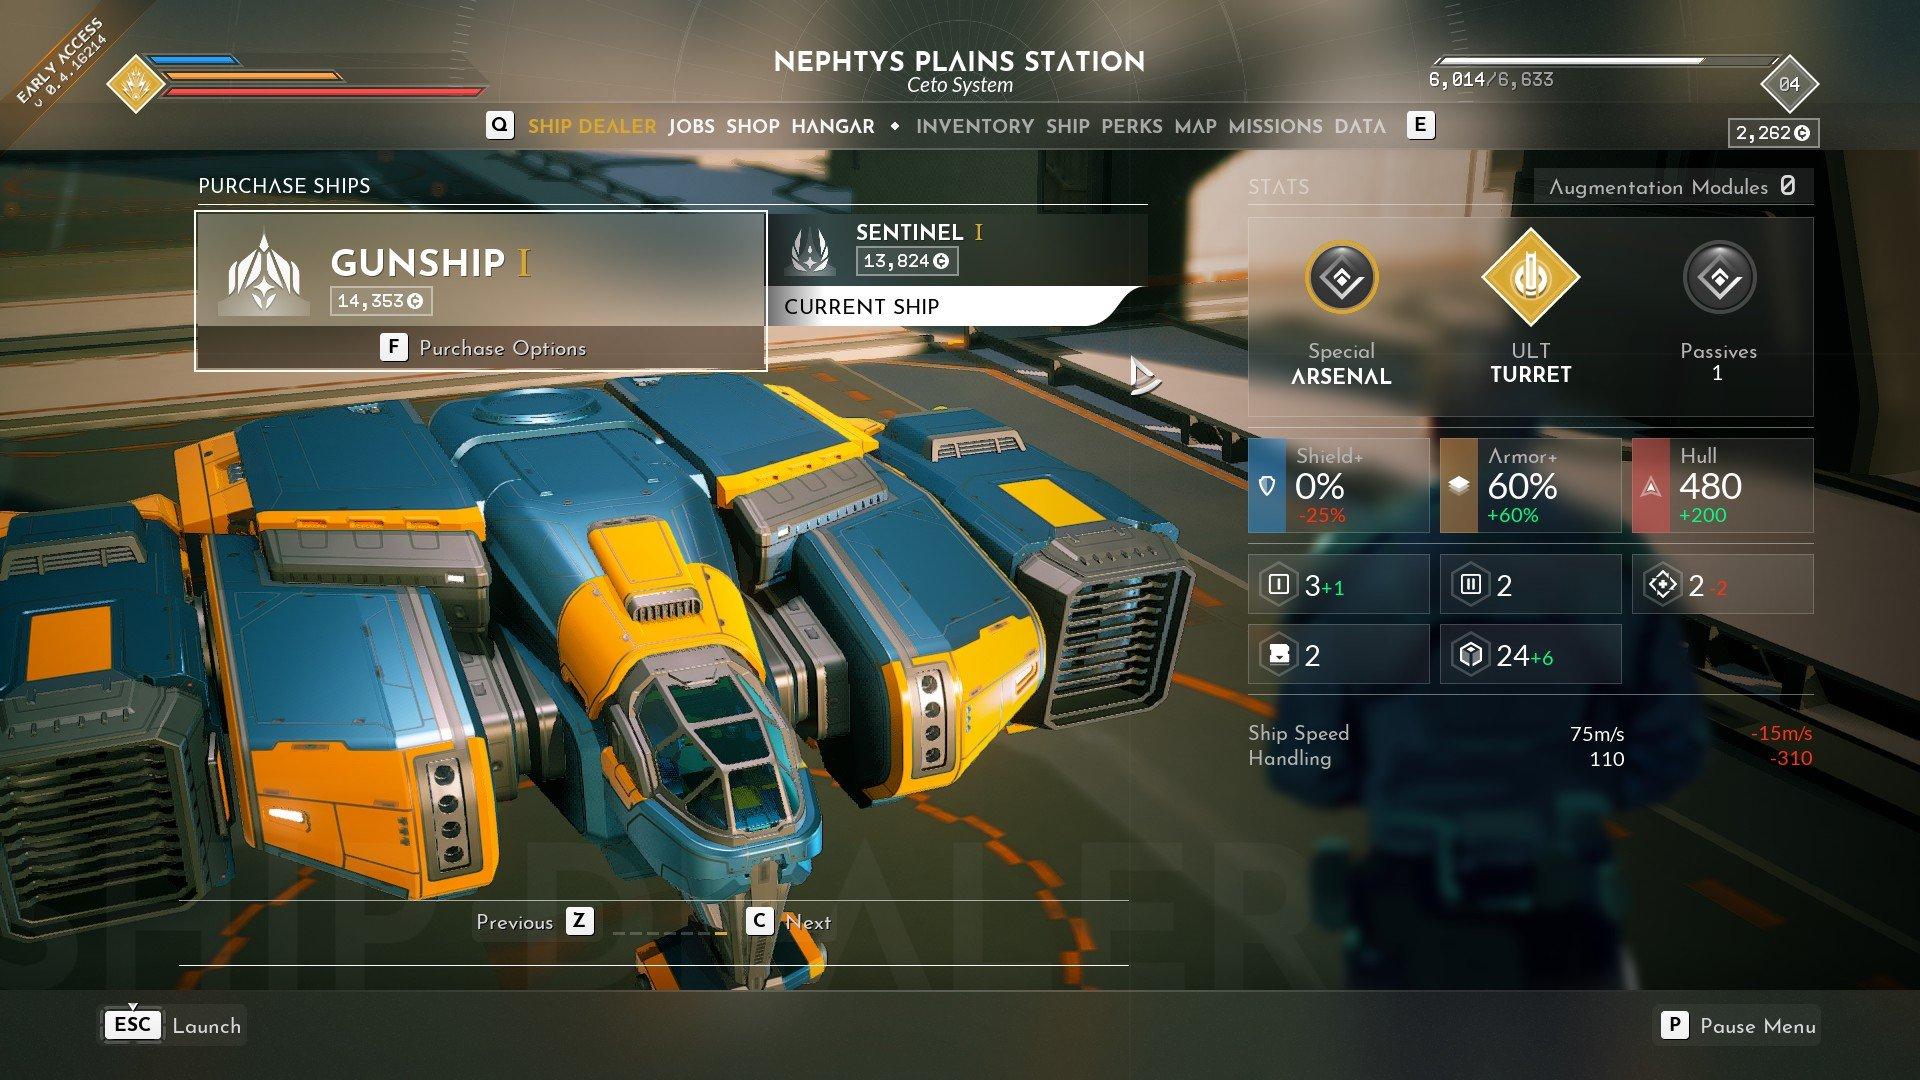 Everspace 2 - Gunship I 3